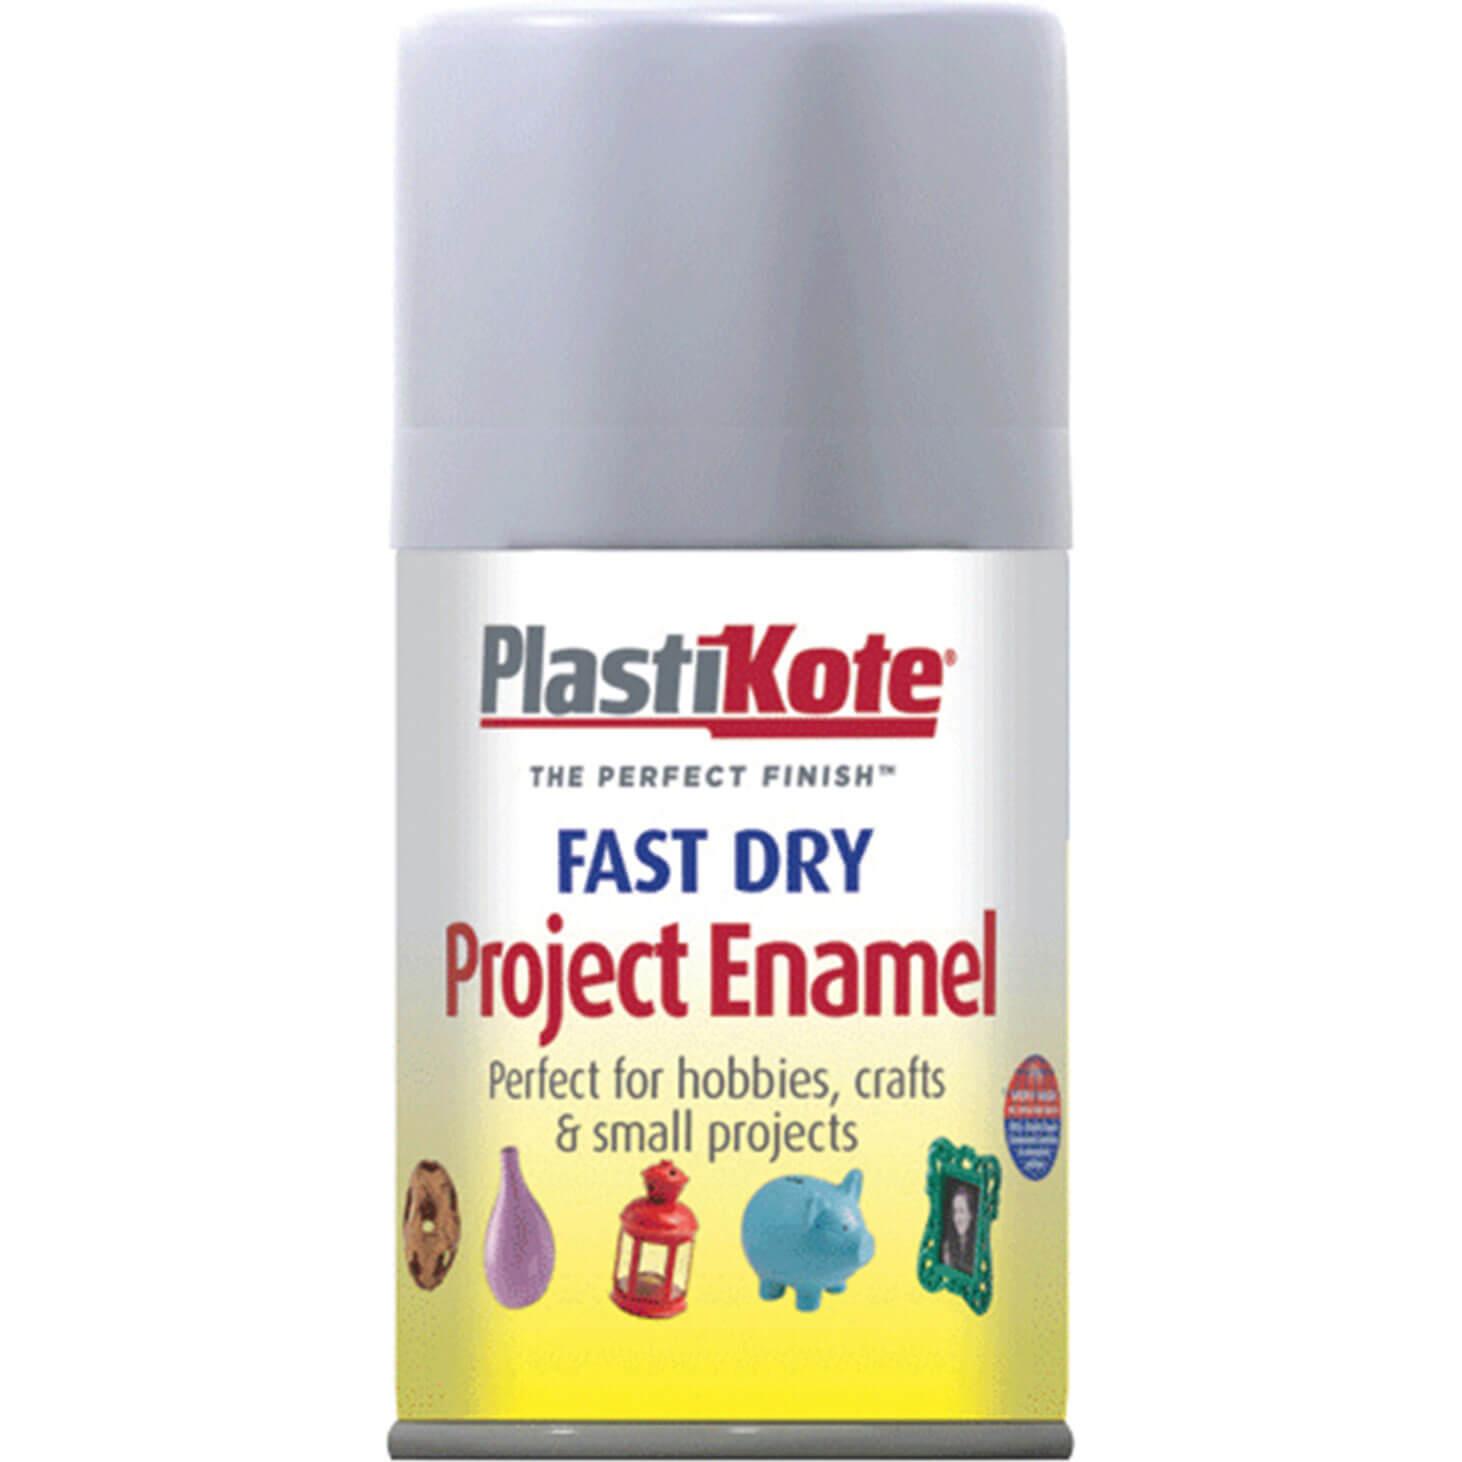 Image of Plastikote Dry Enamel Aerosol Spray Paint Aluminium 100ml